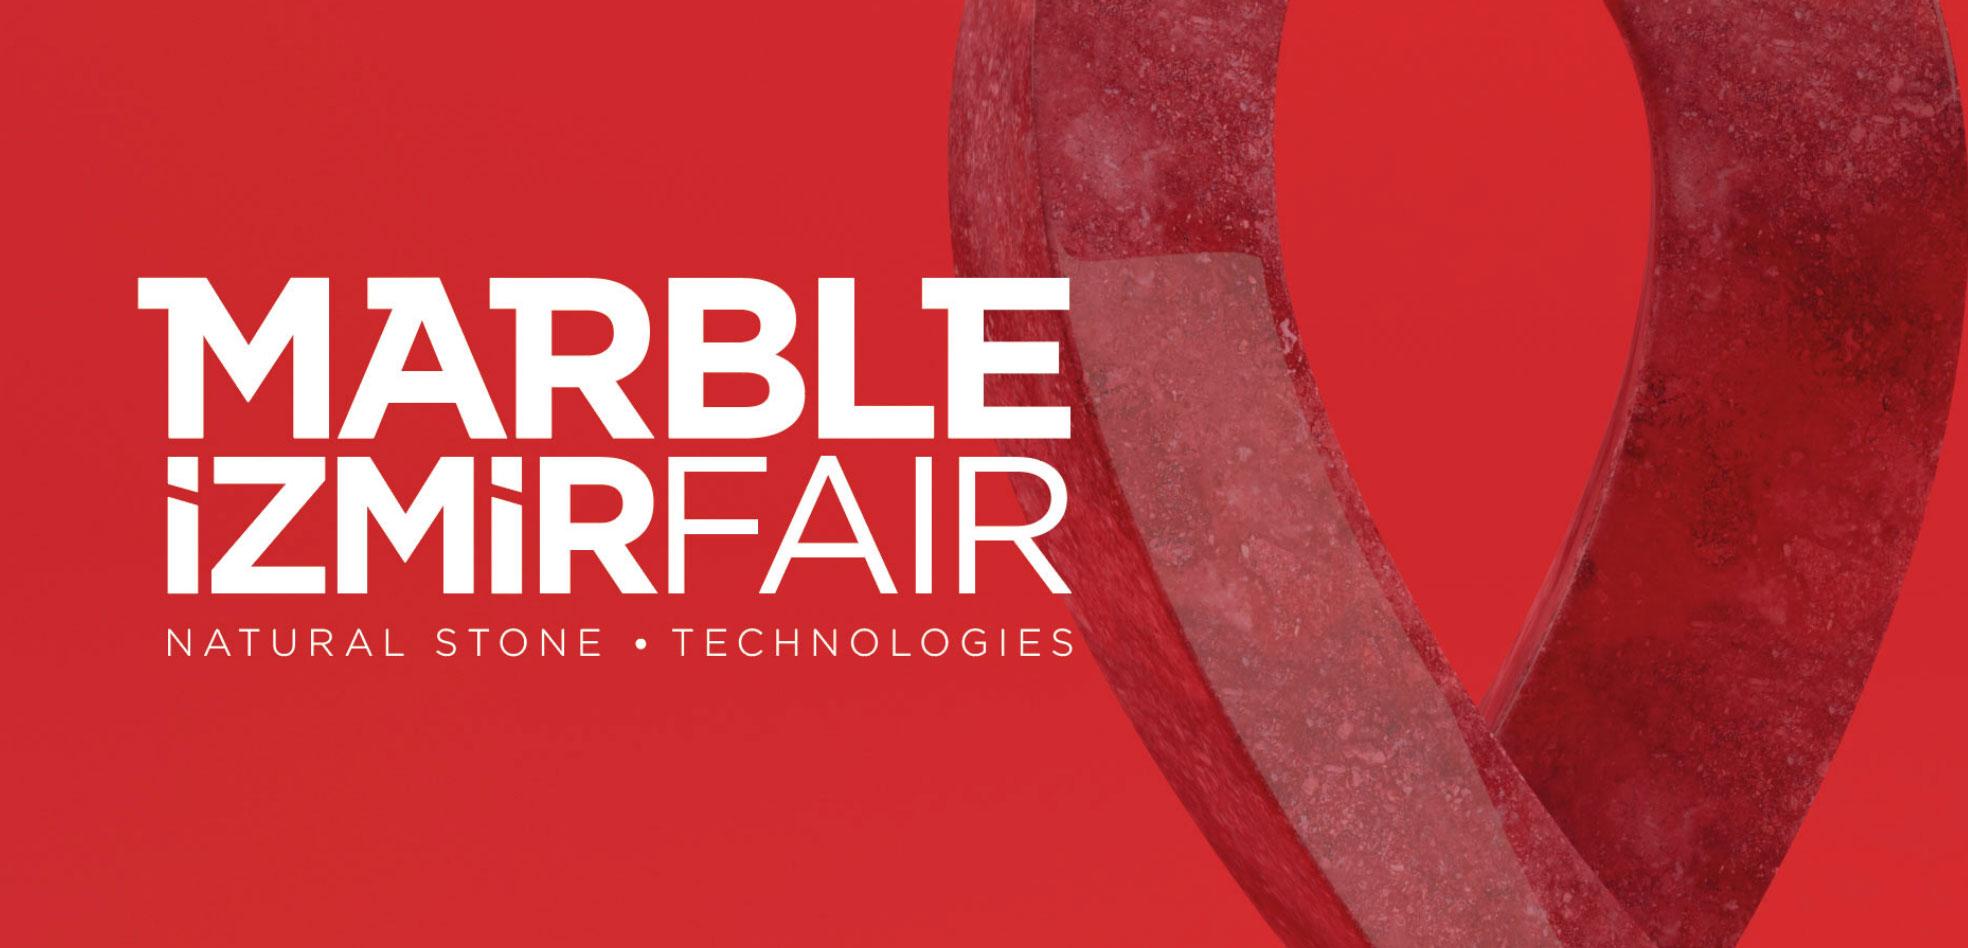 marble-izmir-fair